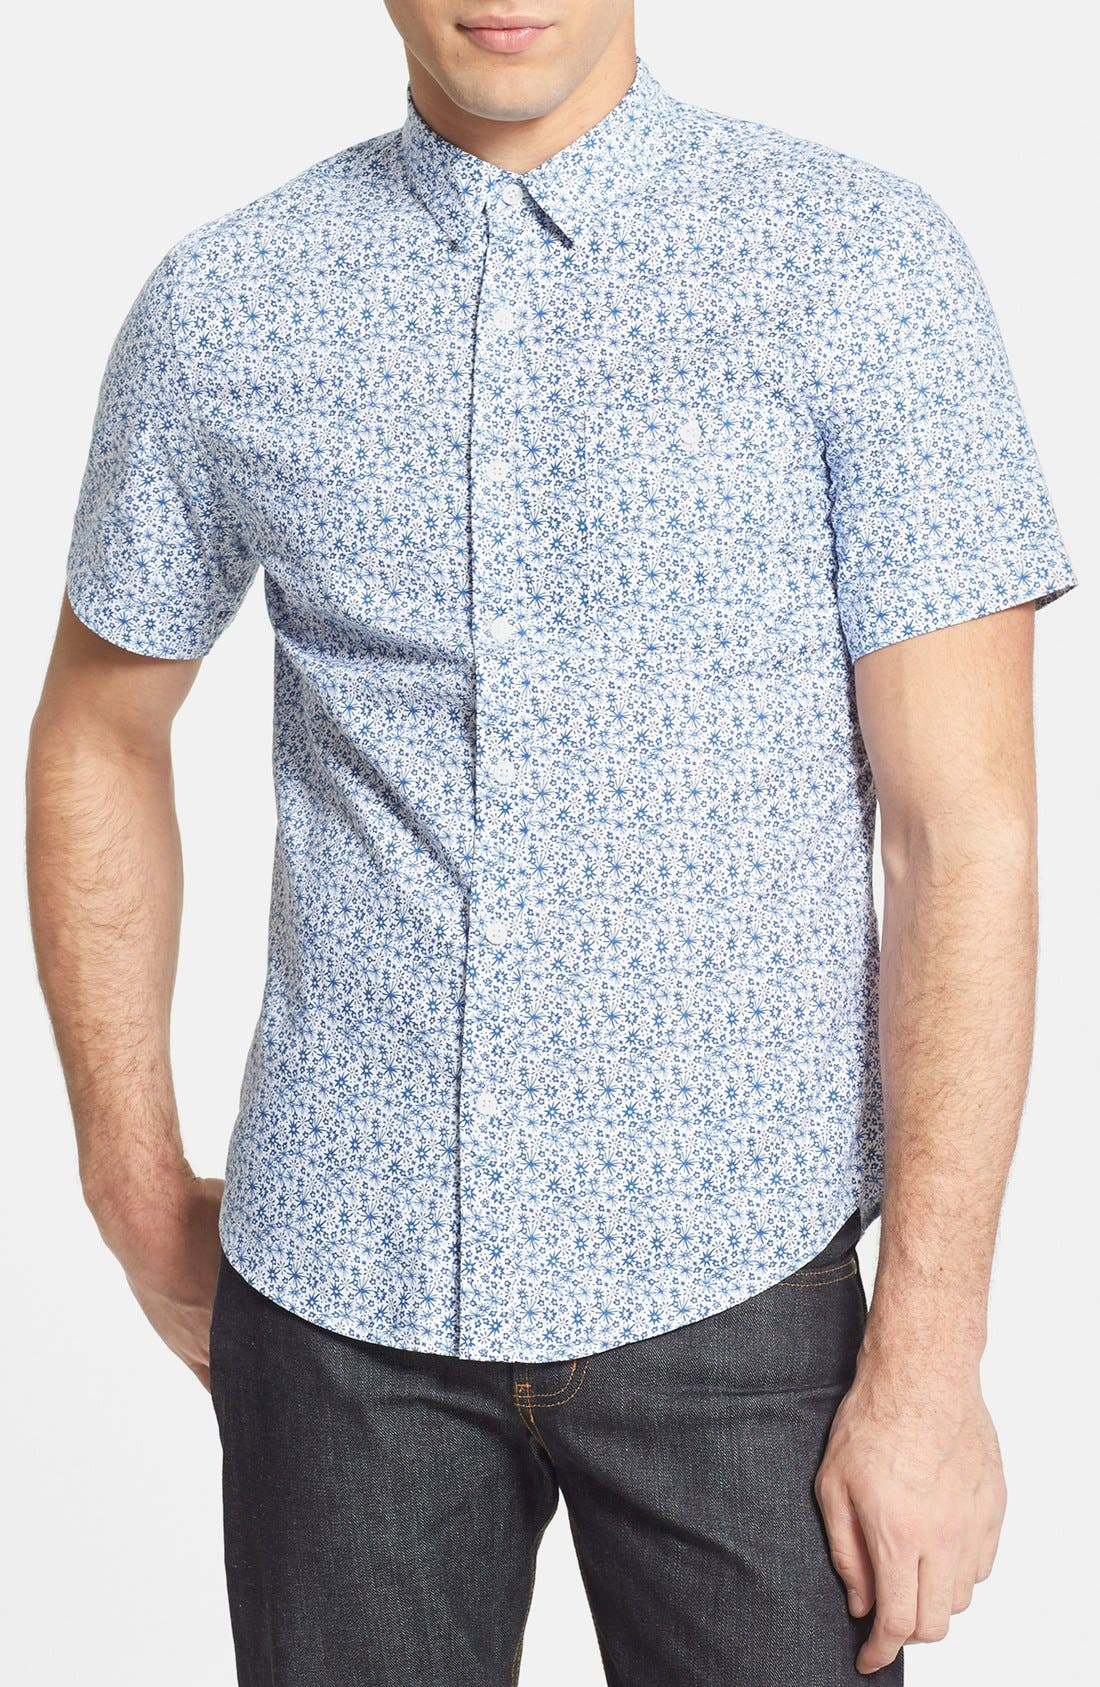 Main Image - Topman Slim Fit Short Sleeve Ditsy Floral Print Shirt